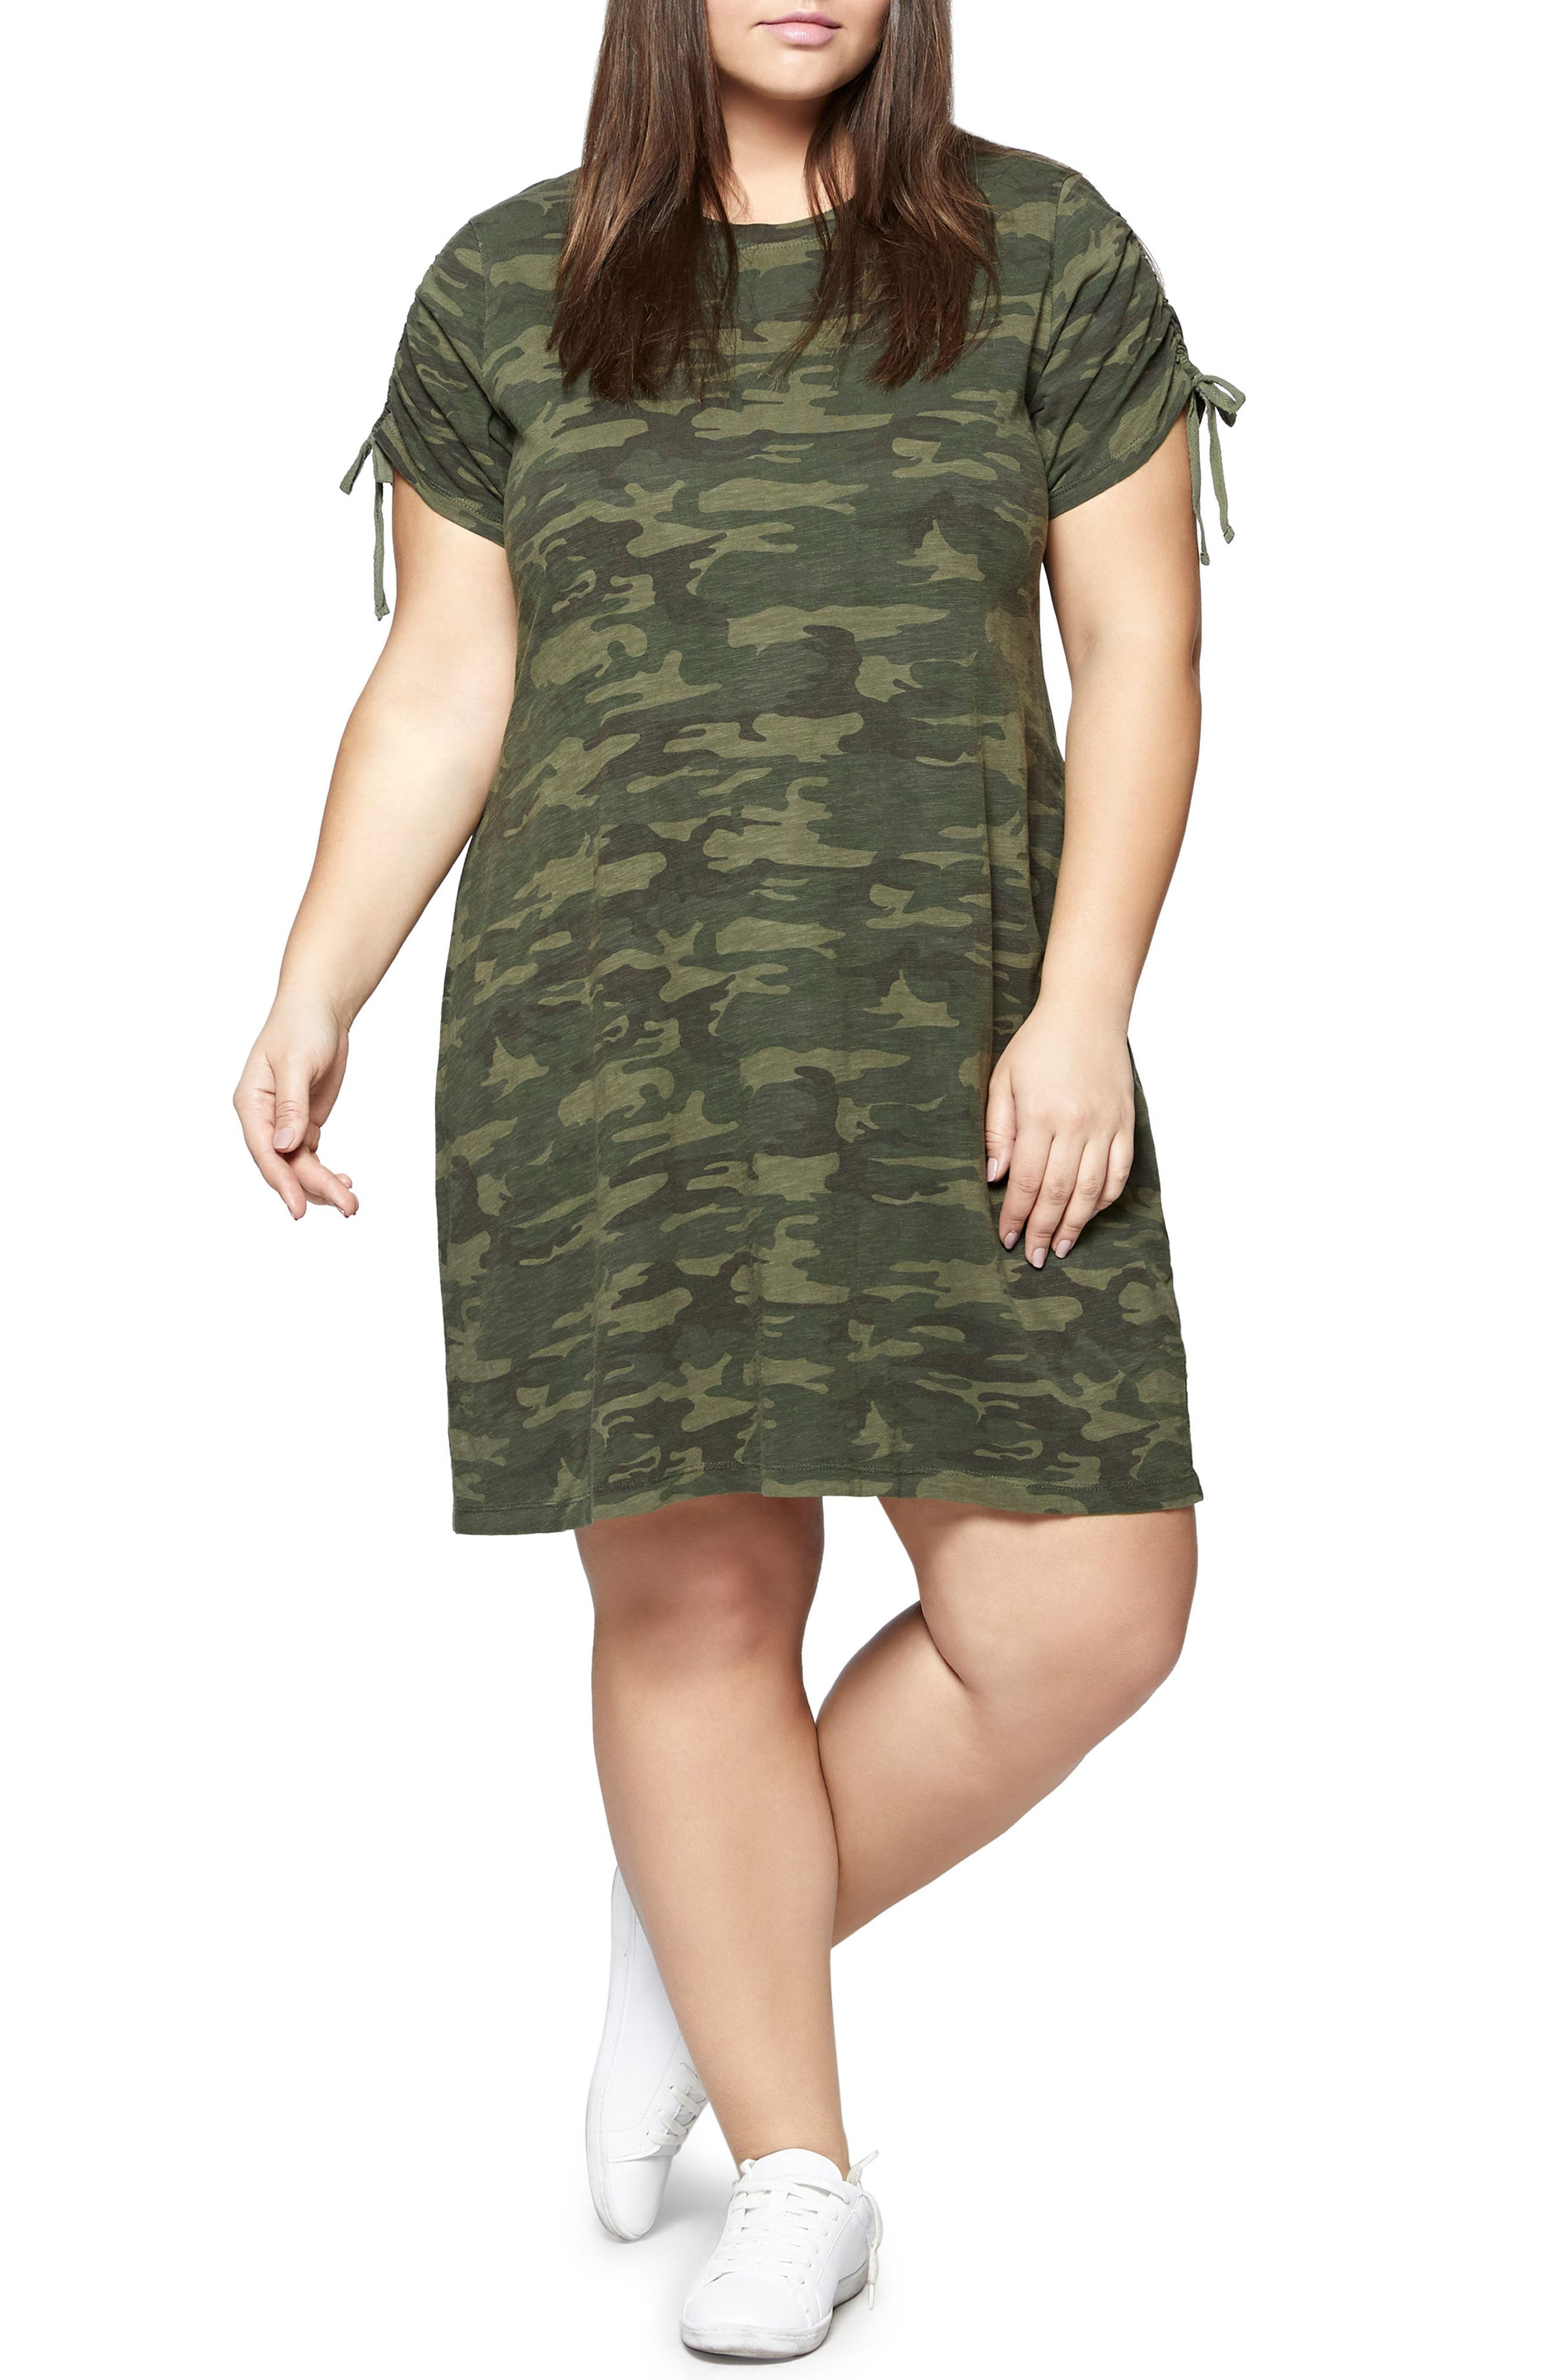 Ojai Camo T-Shirt Dress,                         Main,                         color, MOTHER NATURE CAMO